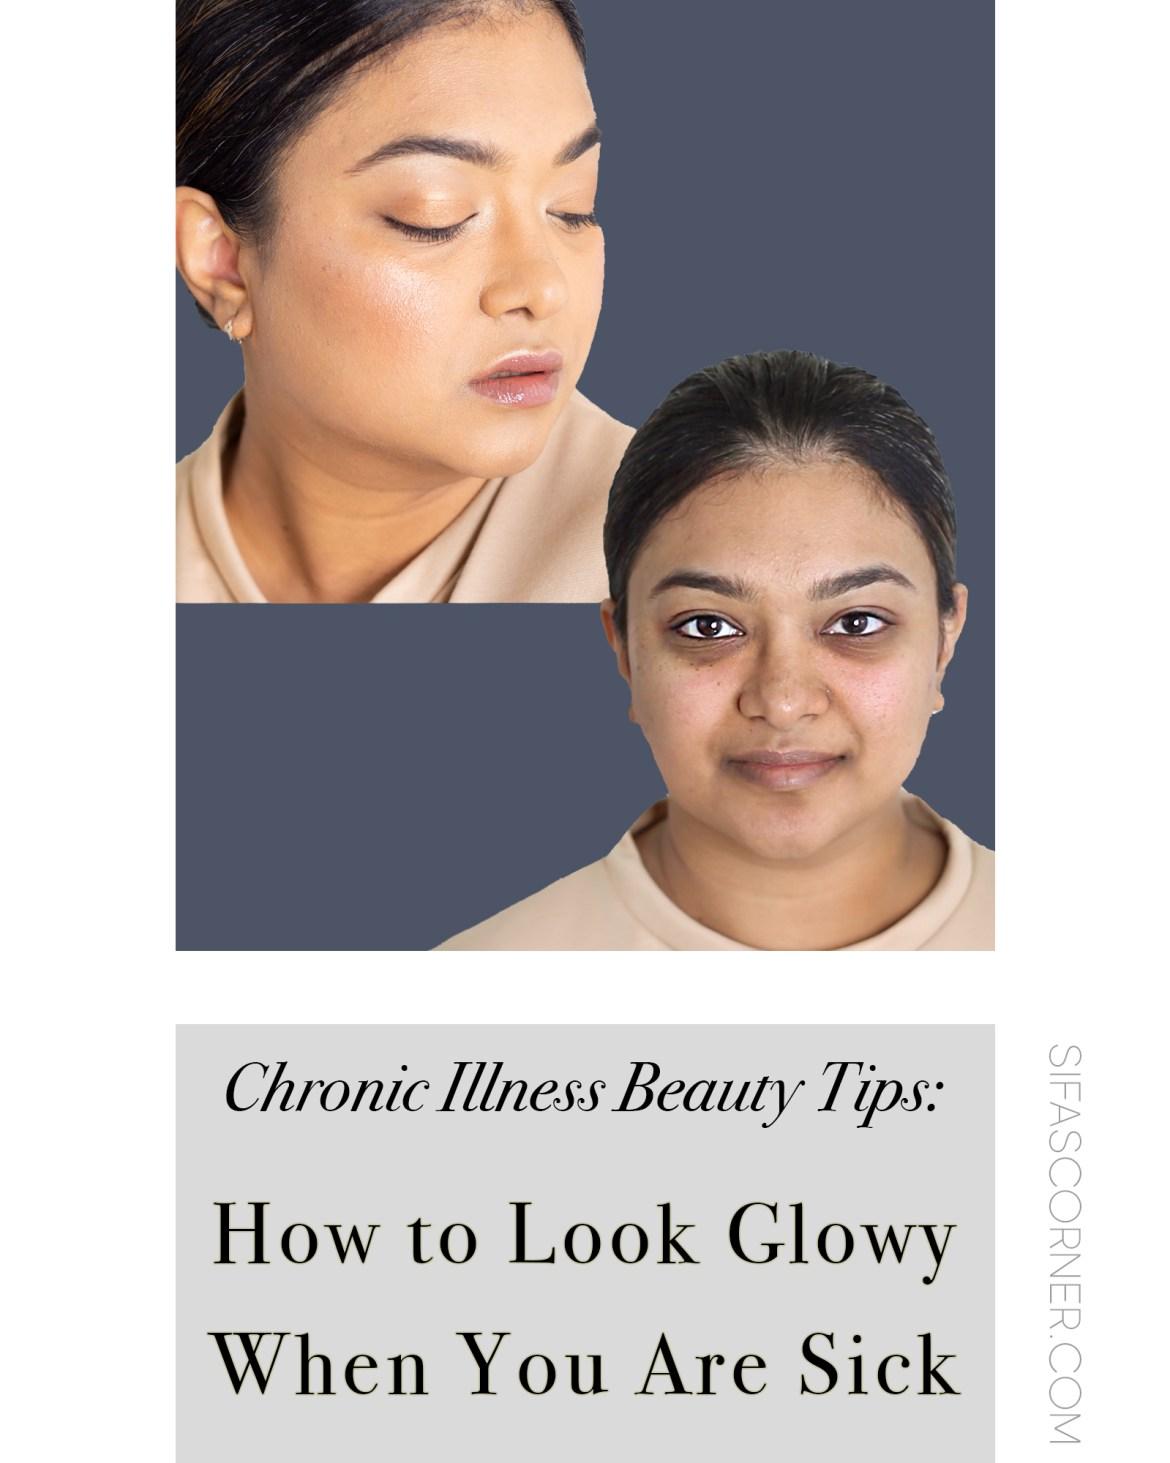 Chronic Illness Beauty Tips